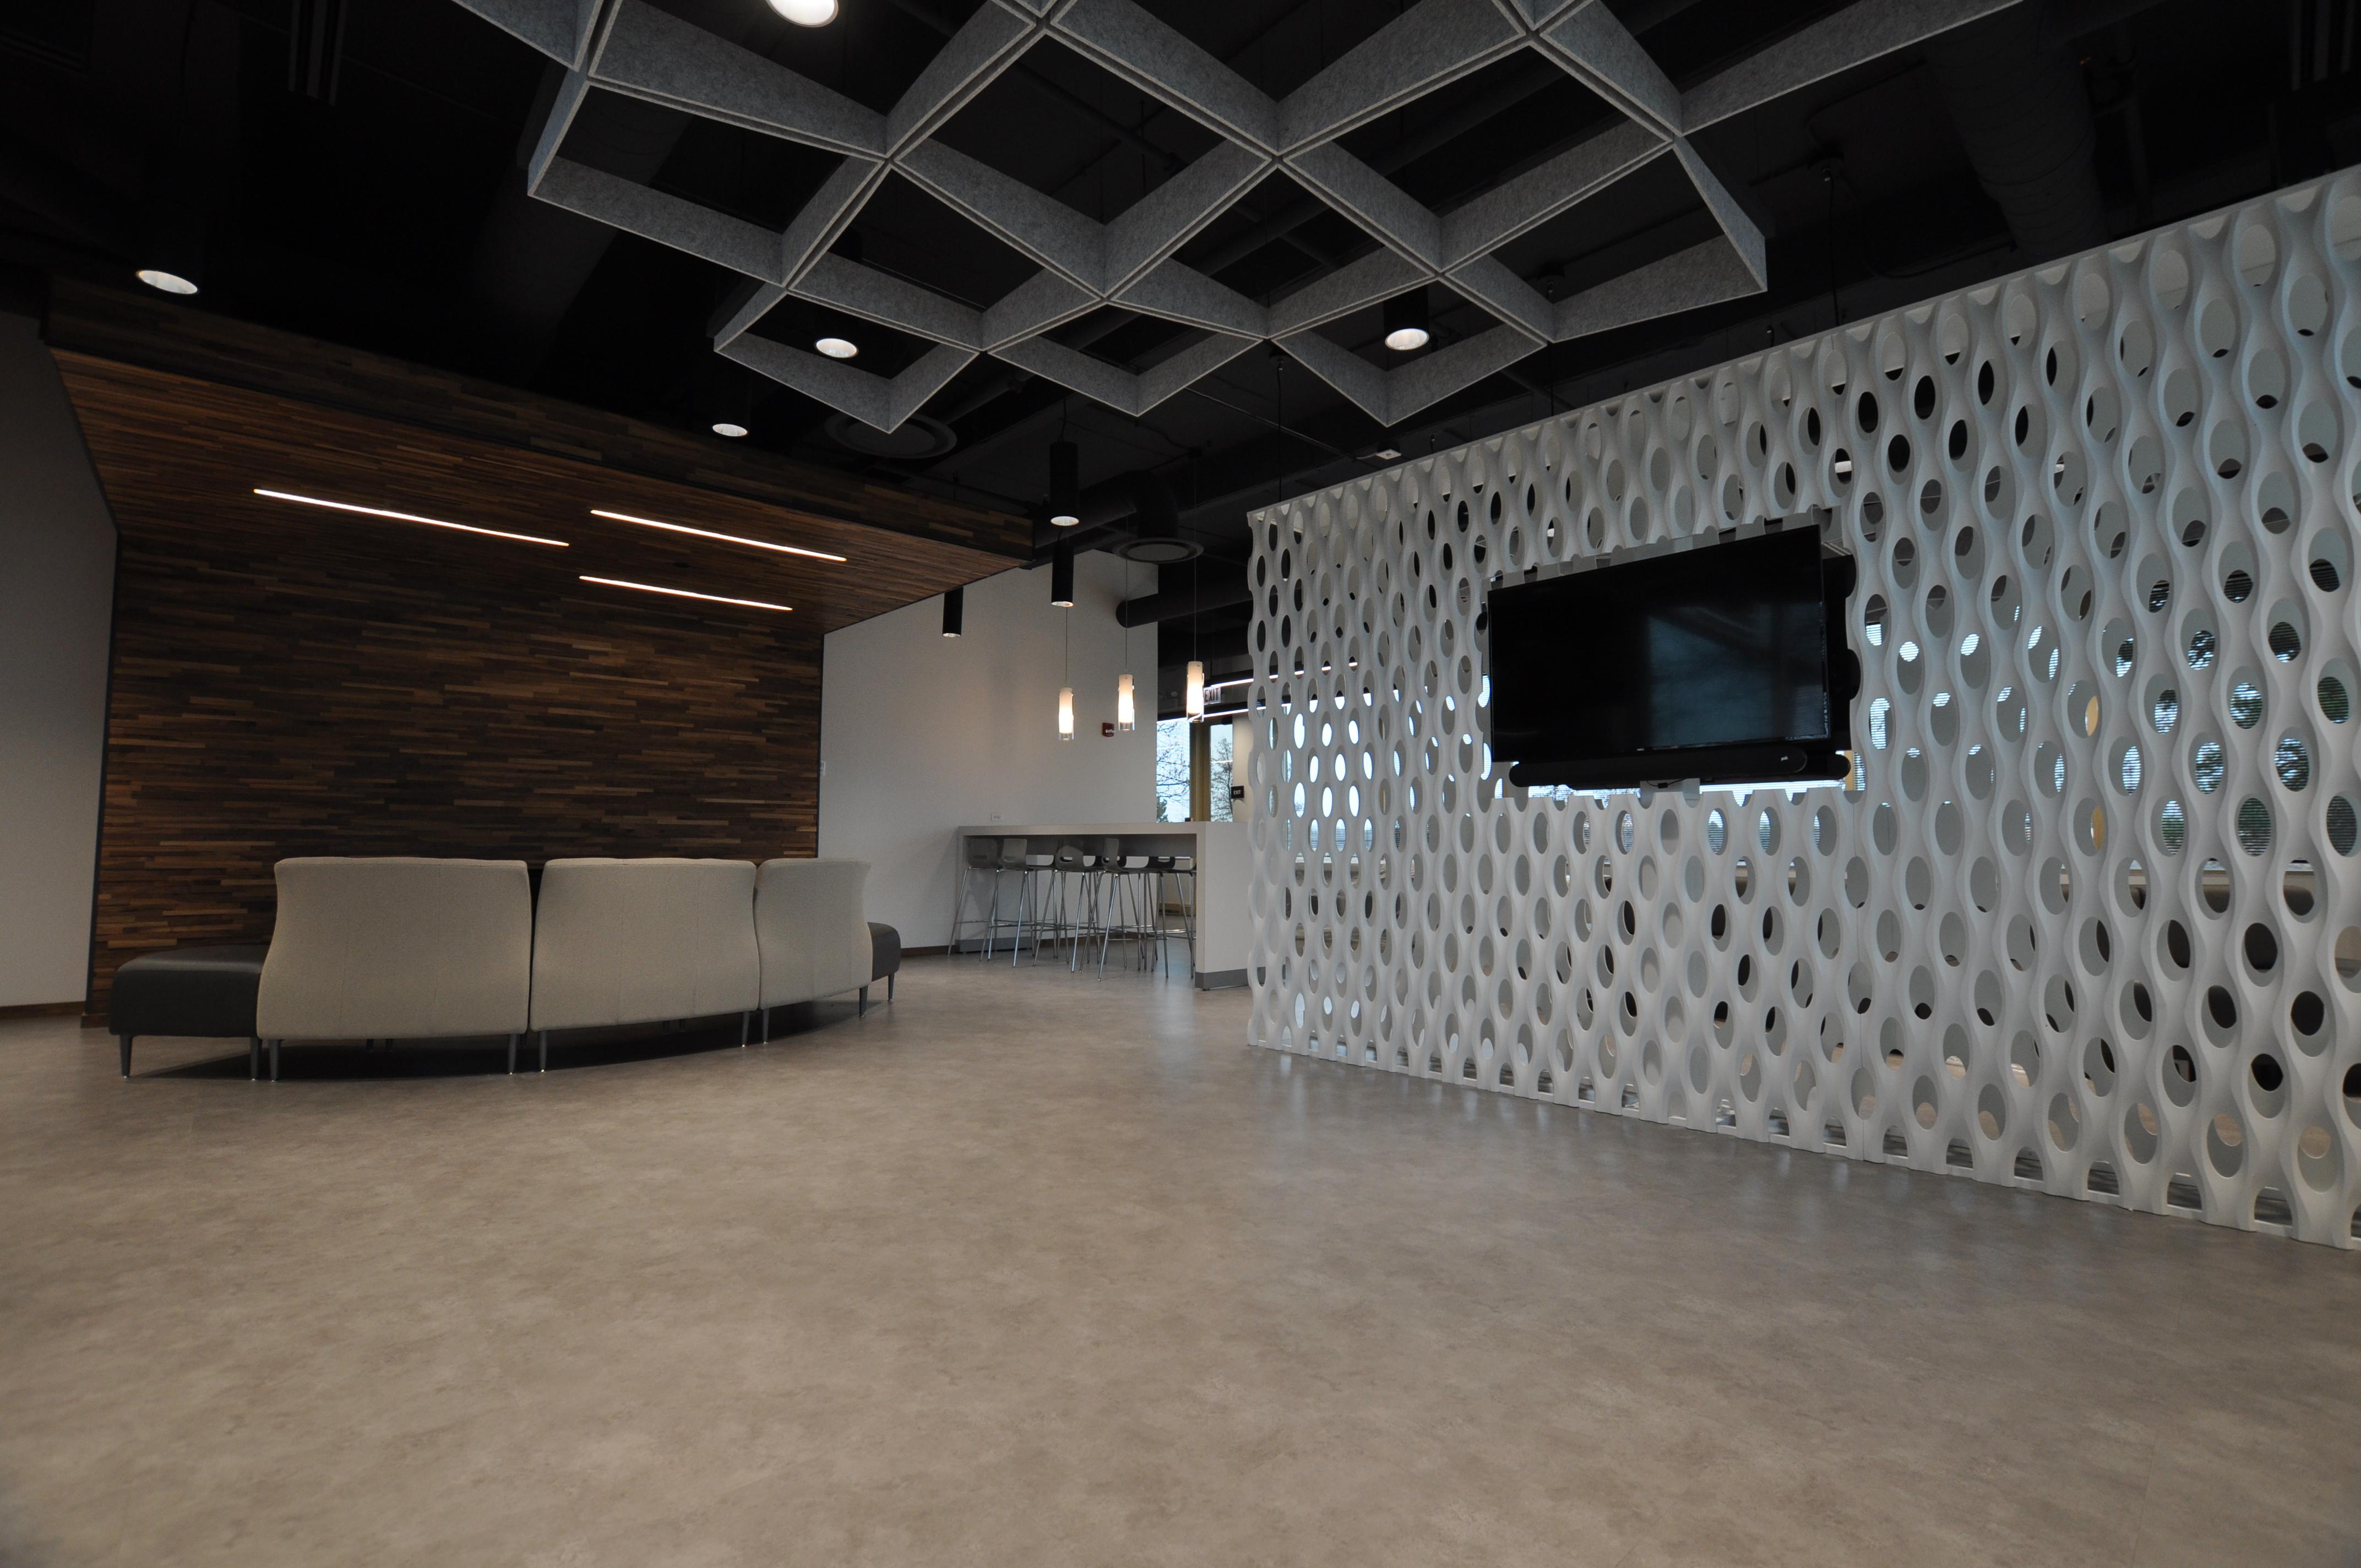 Amenity Center